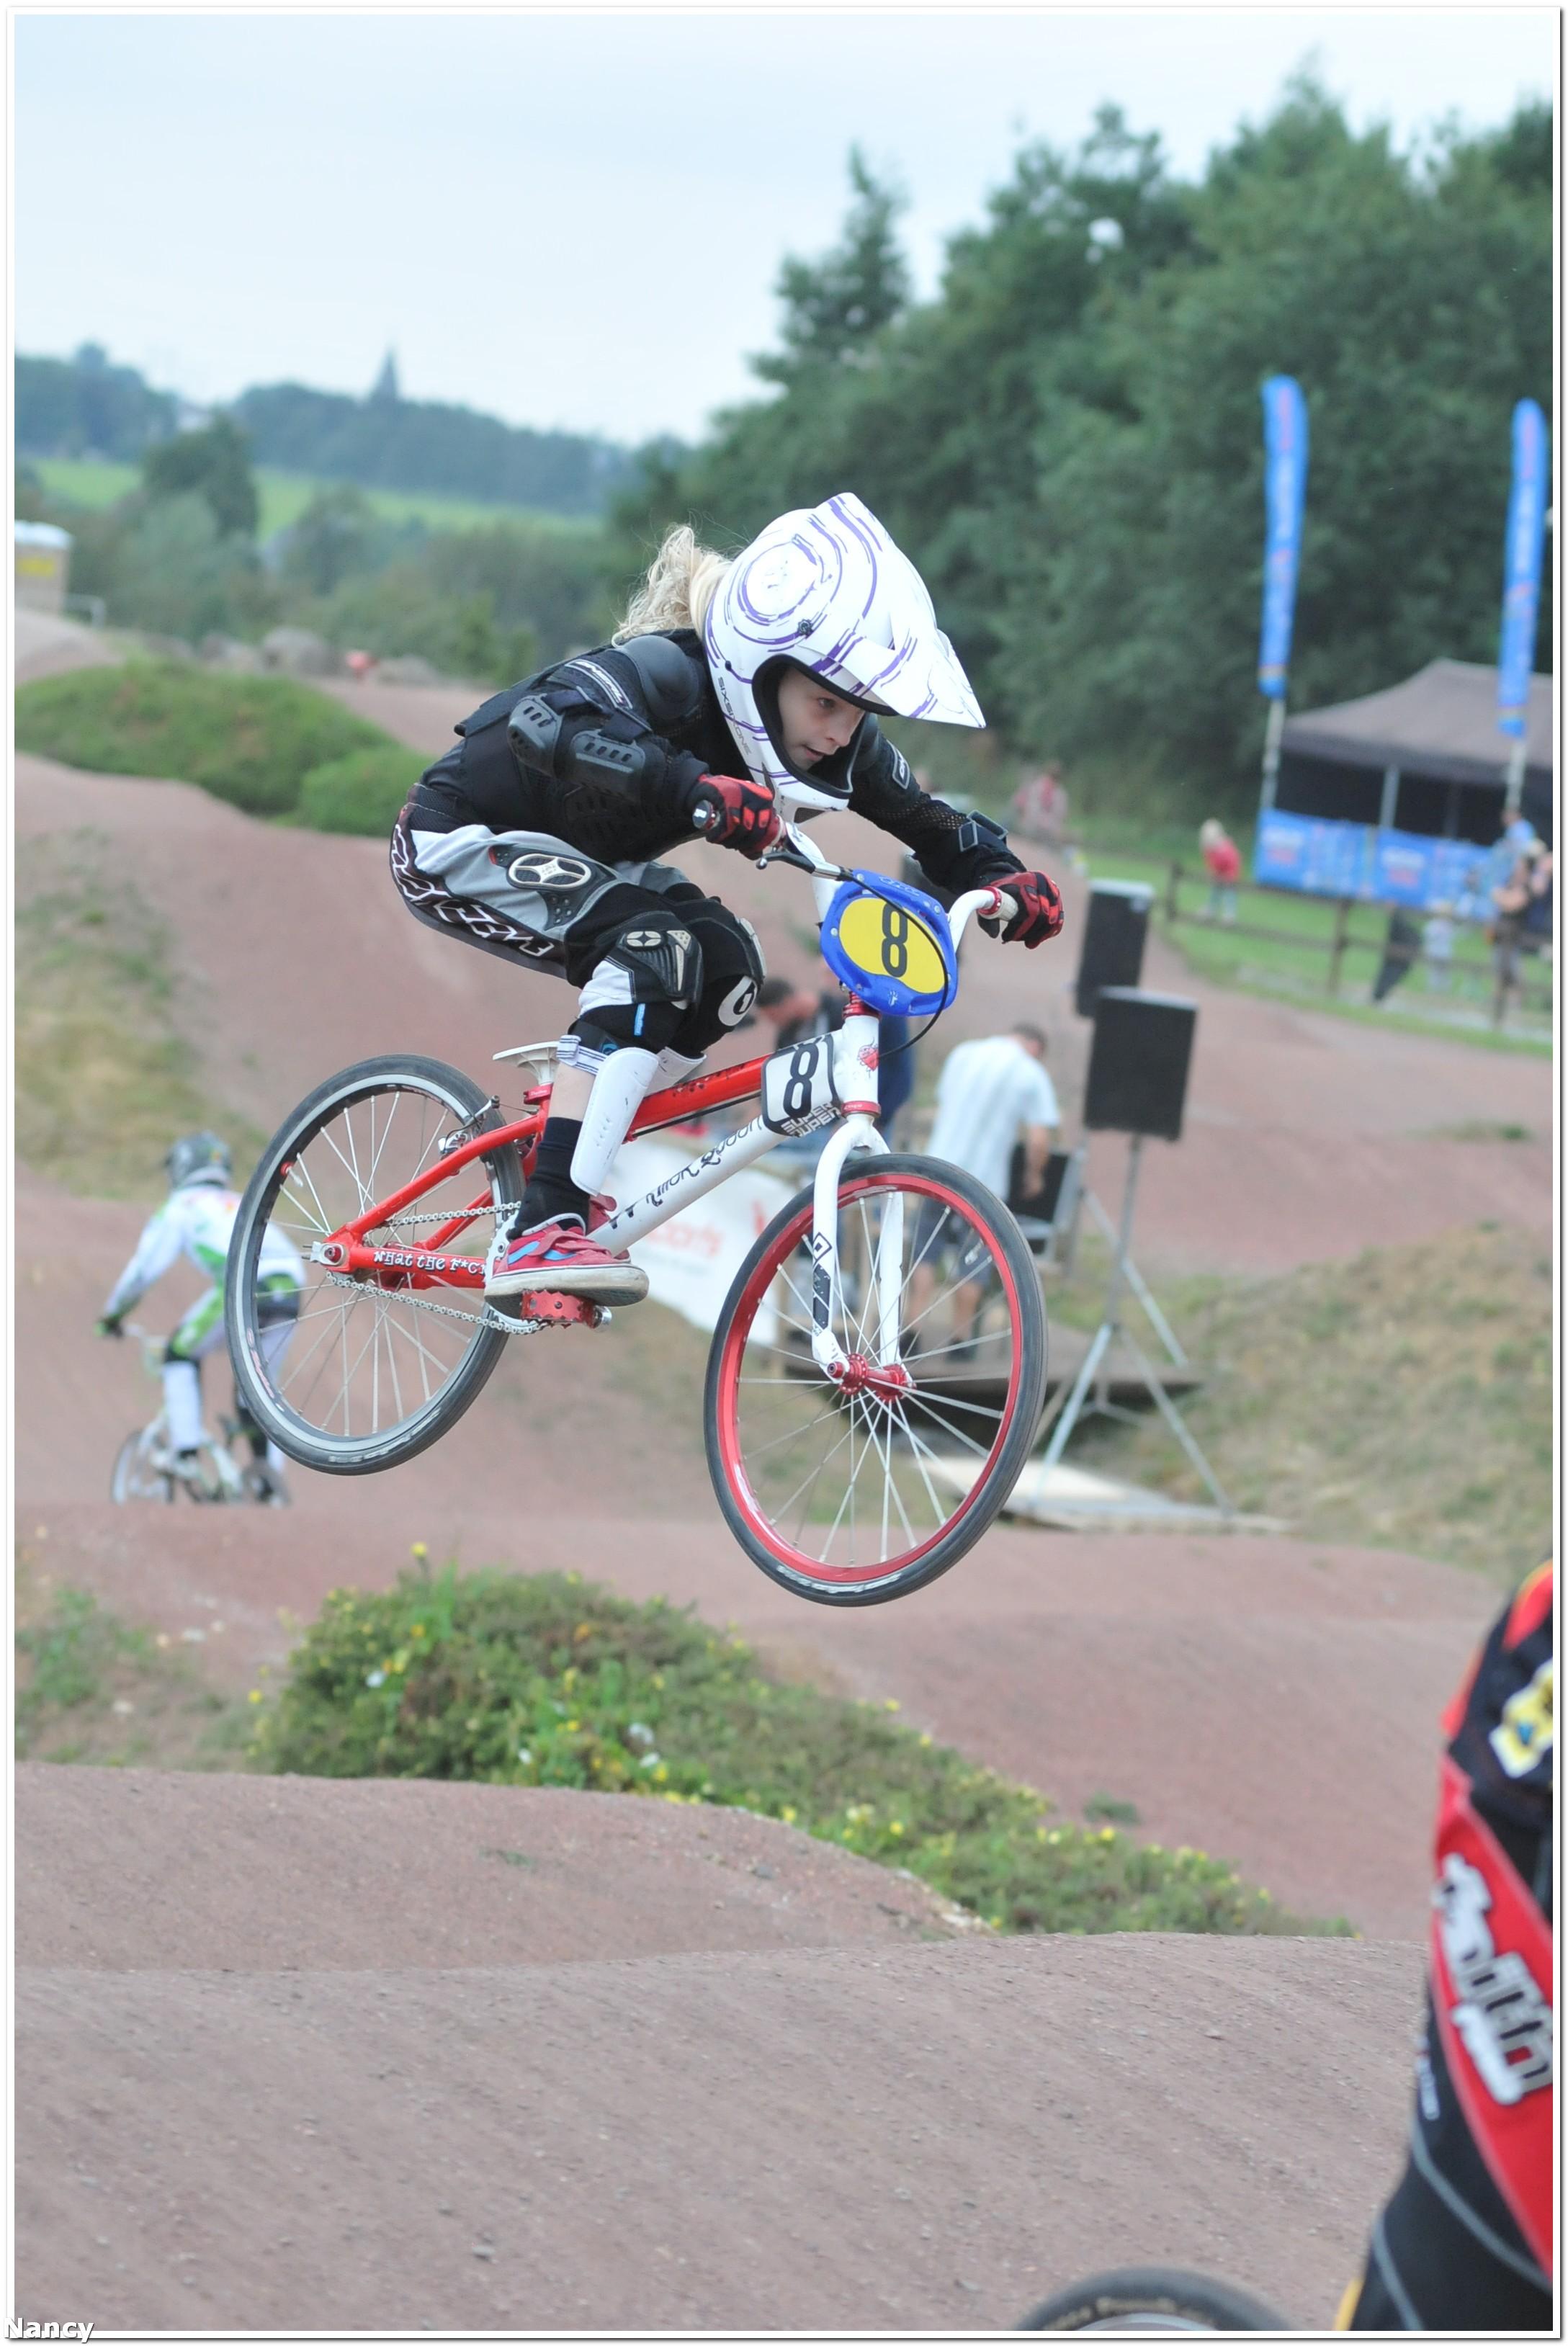 Topcompetitie in Blegny op 08 september 2013